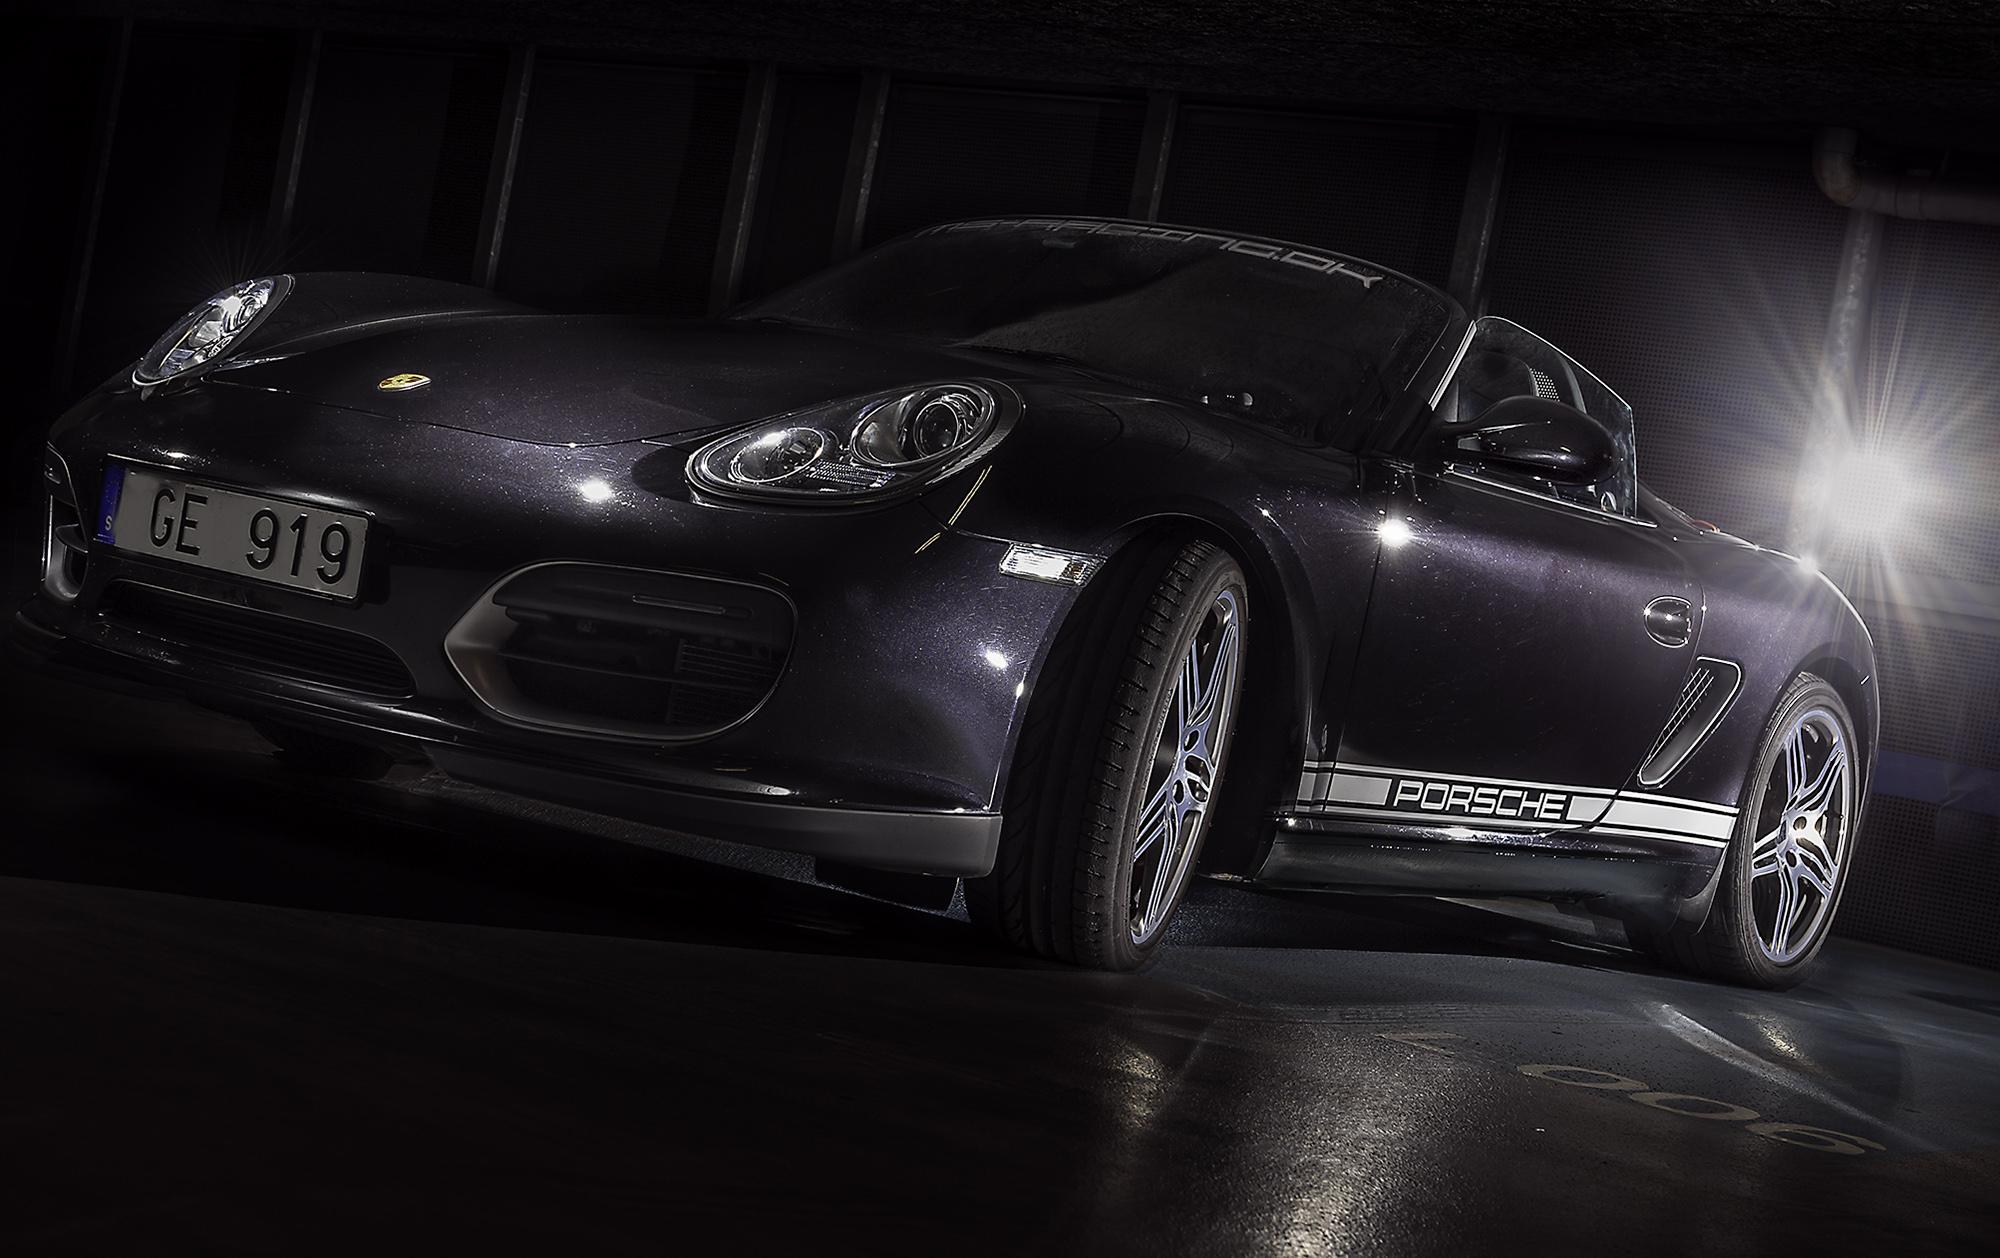 AJU_9857_Porsche-Edit